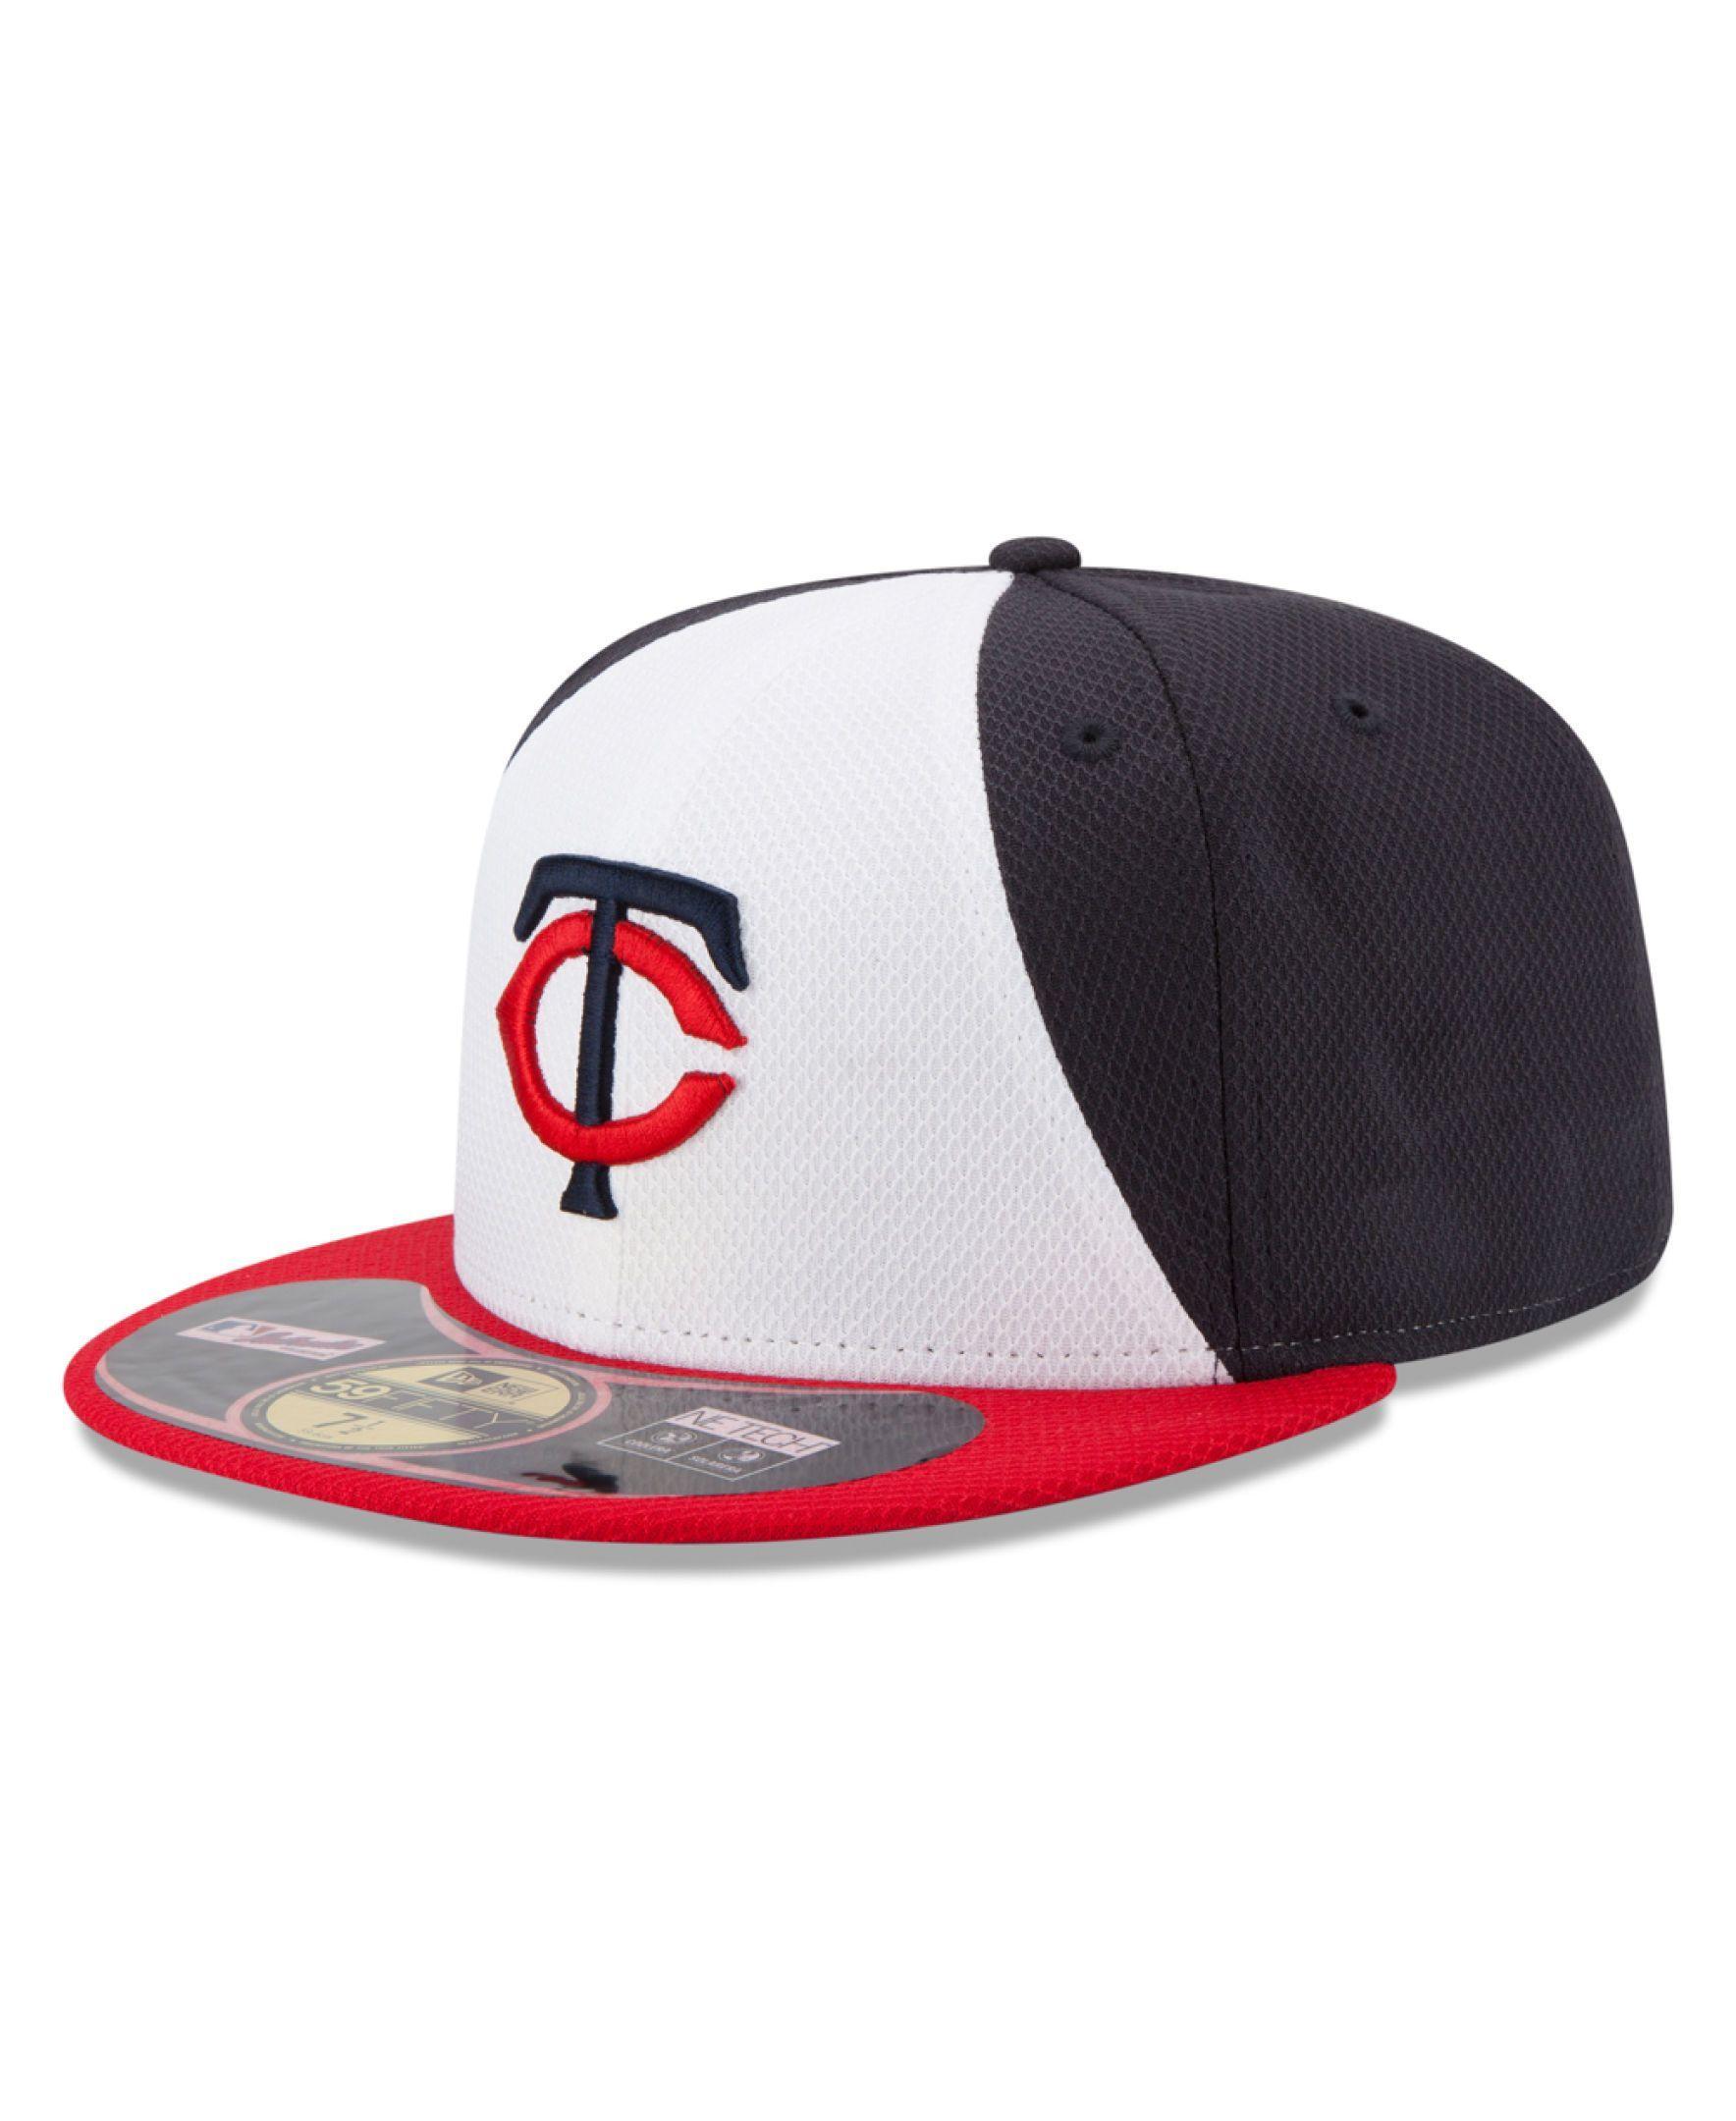 9d0e7339d1c33 New Era Kids  Minnesota Twins 2014 All Star Game 59FIFTY Cap ...